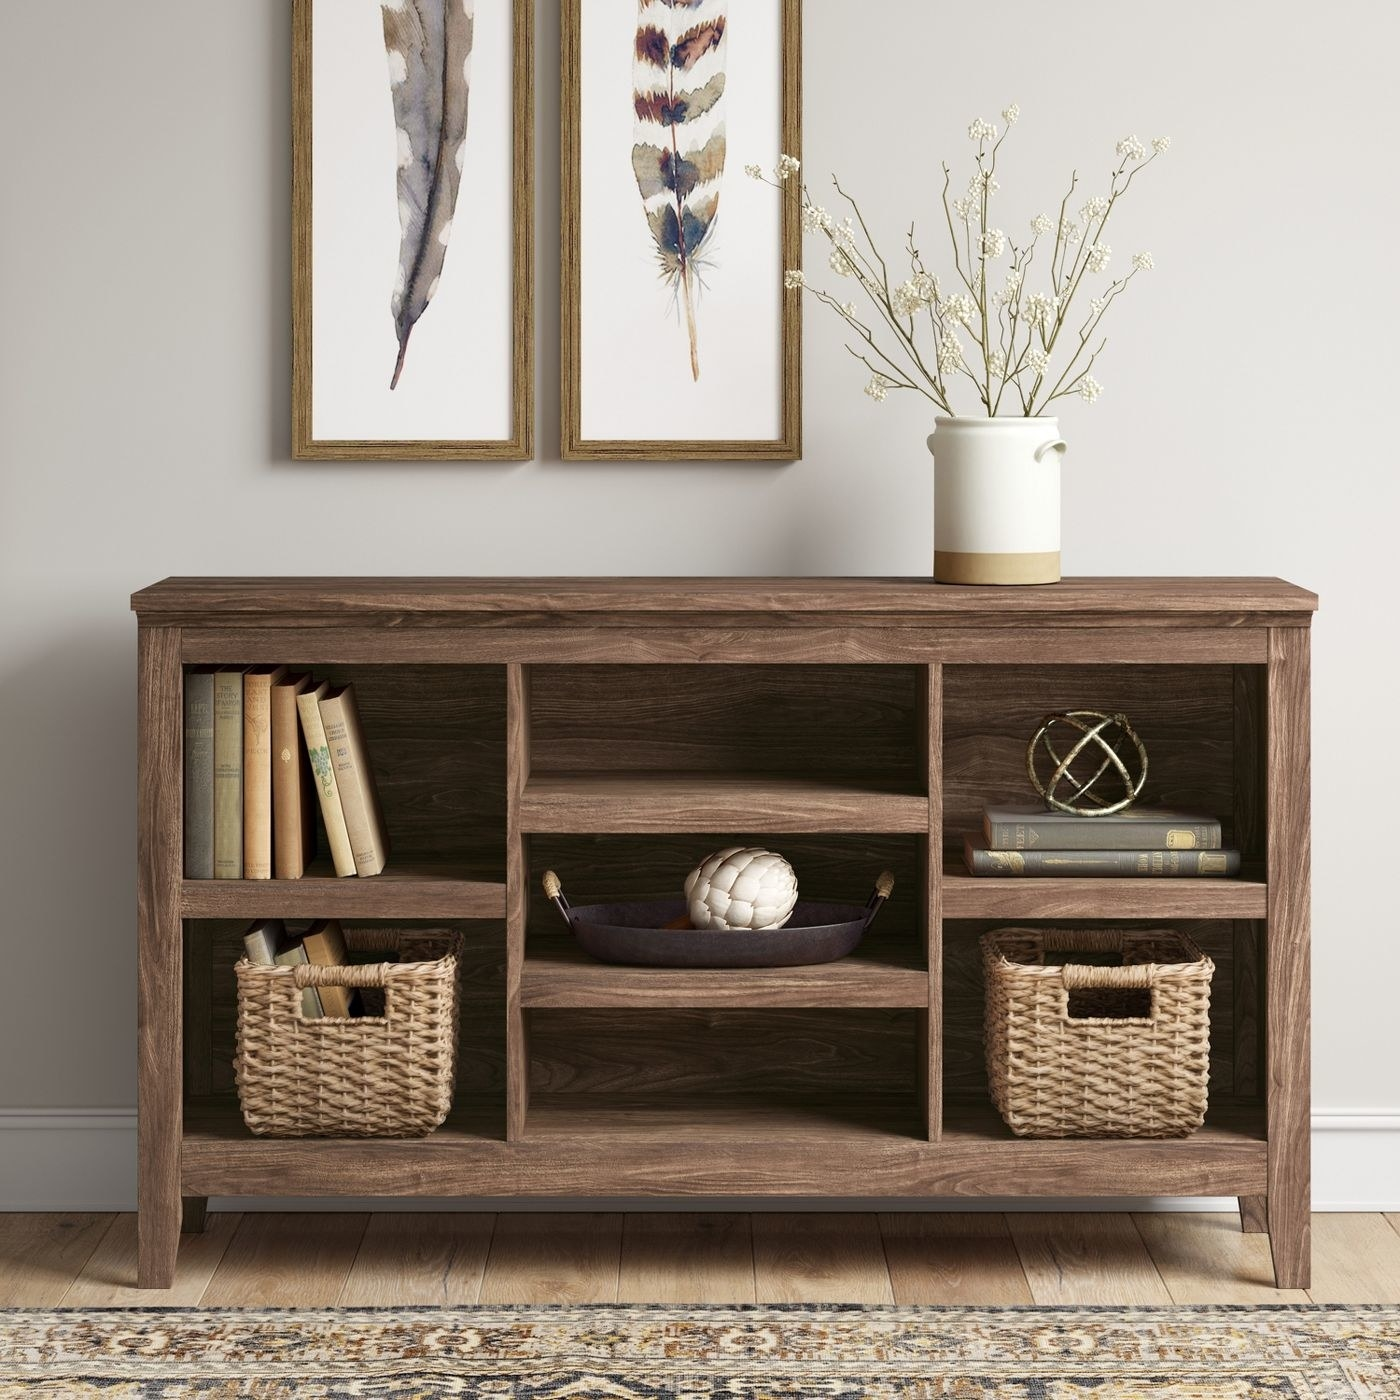 A brown horizontal bookshelf/storage unit in a home